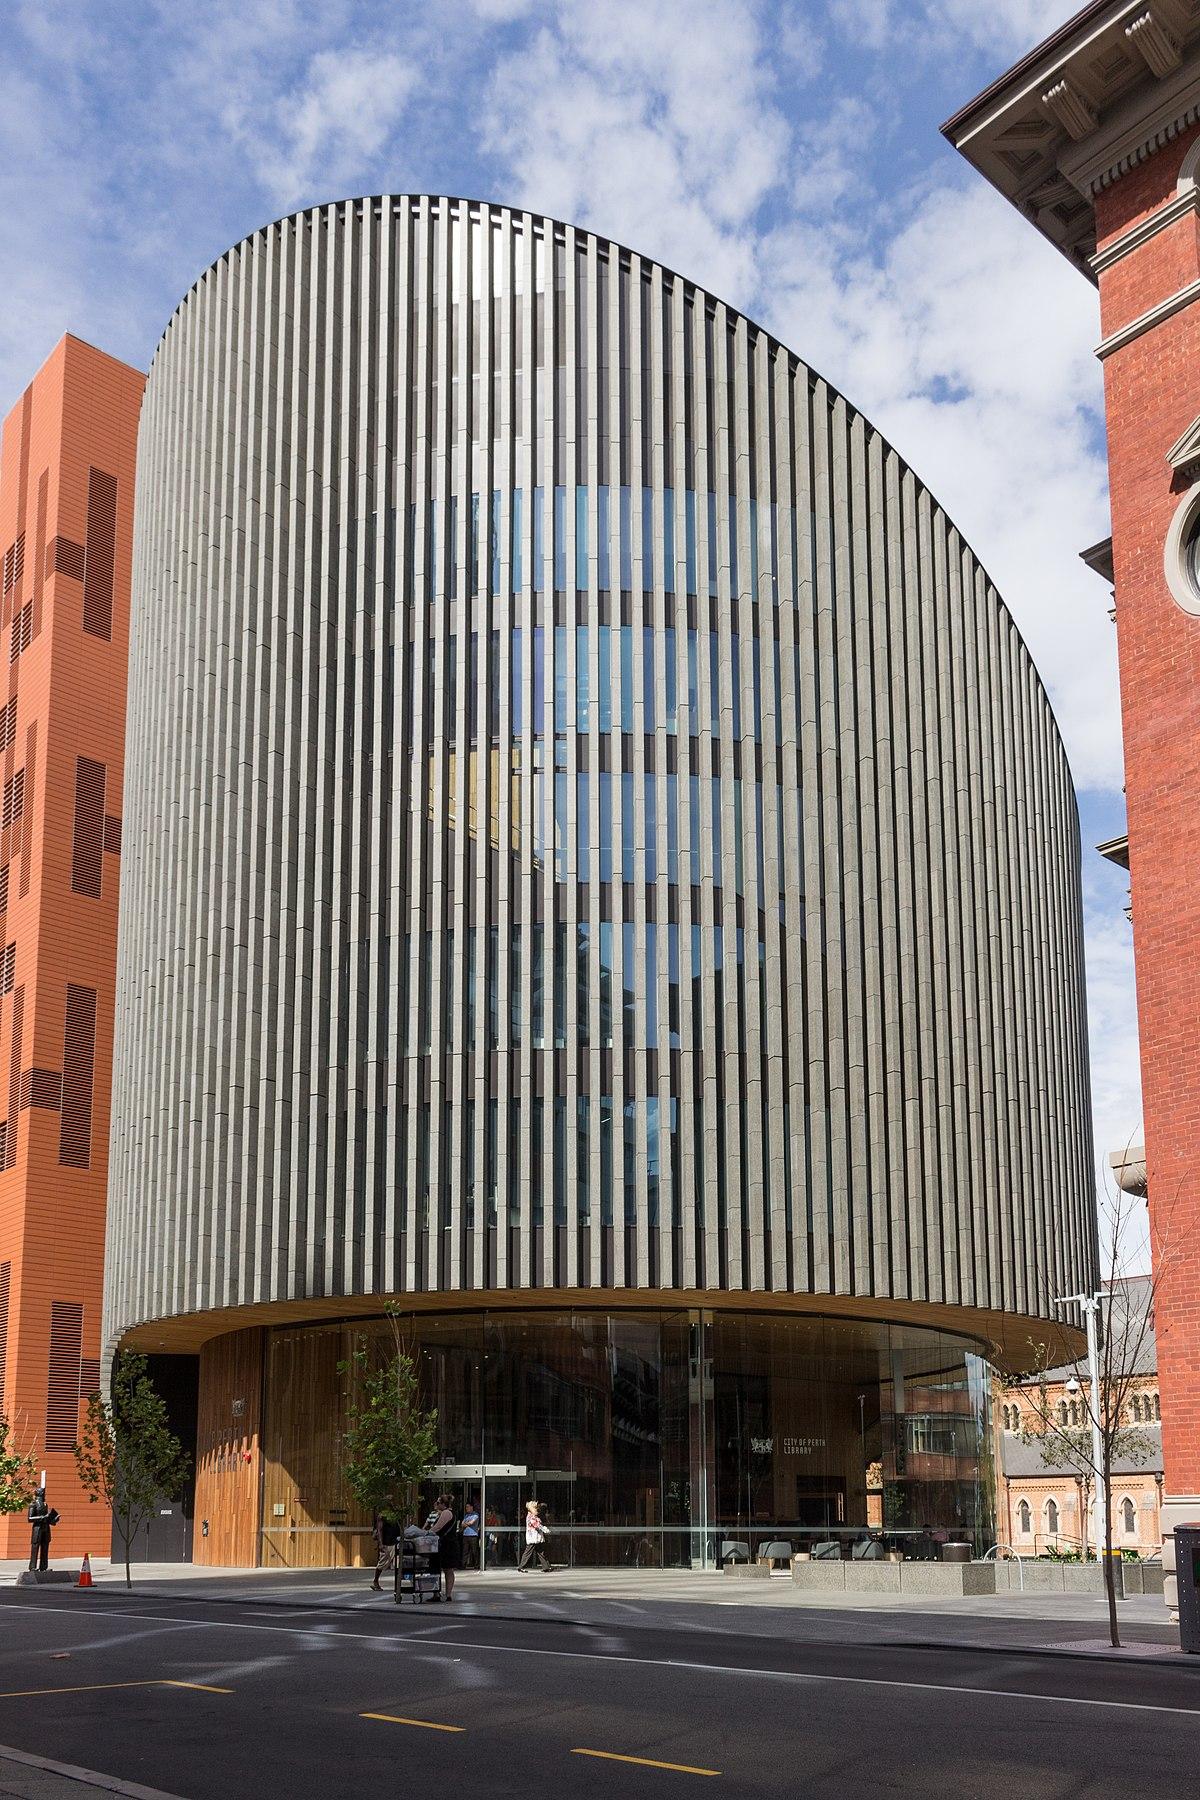 City of Perth Library - Wikipedia